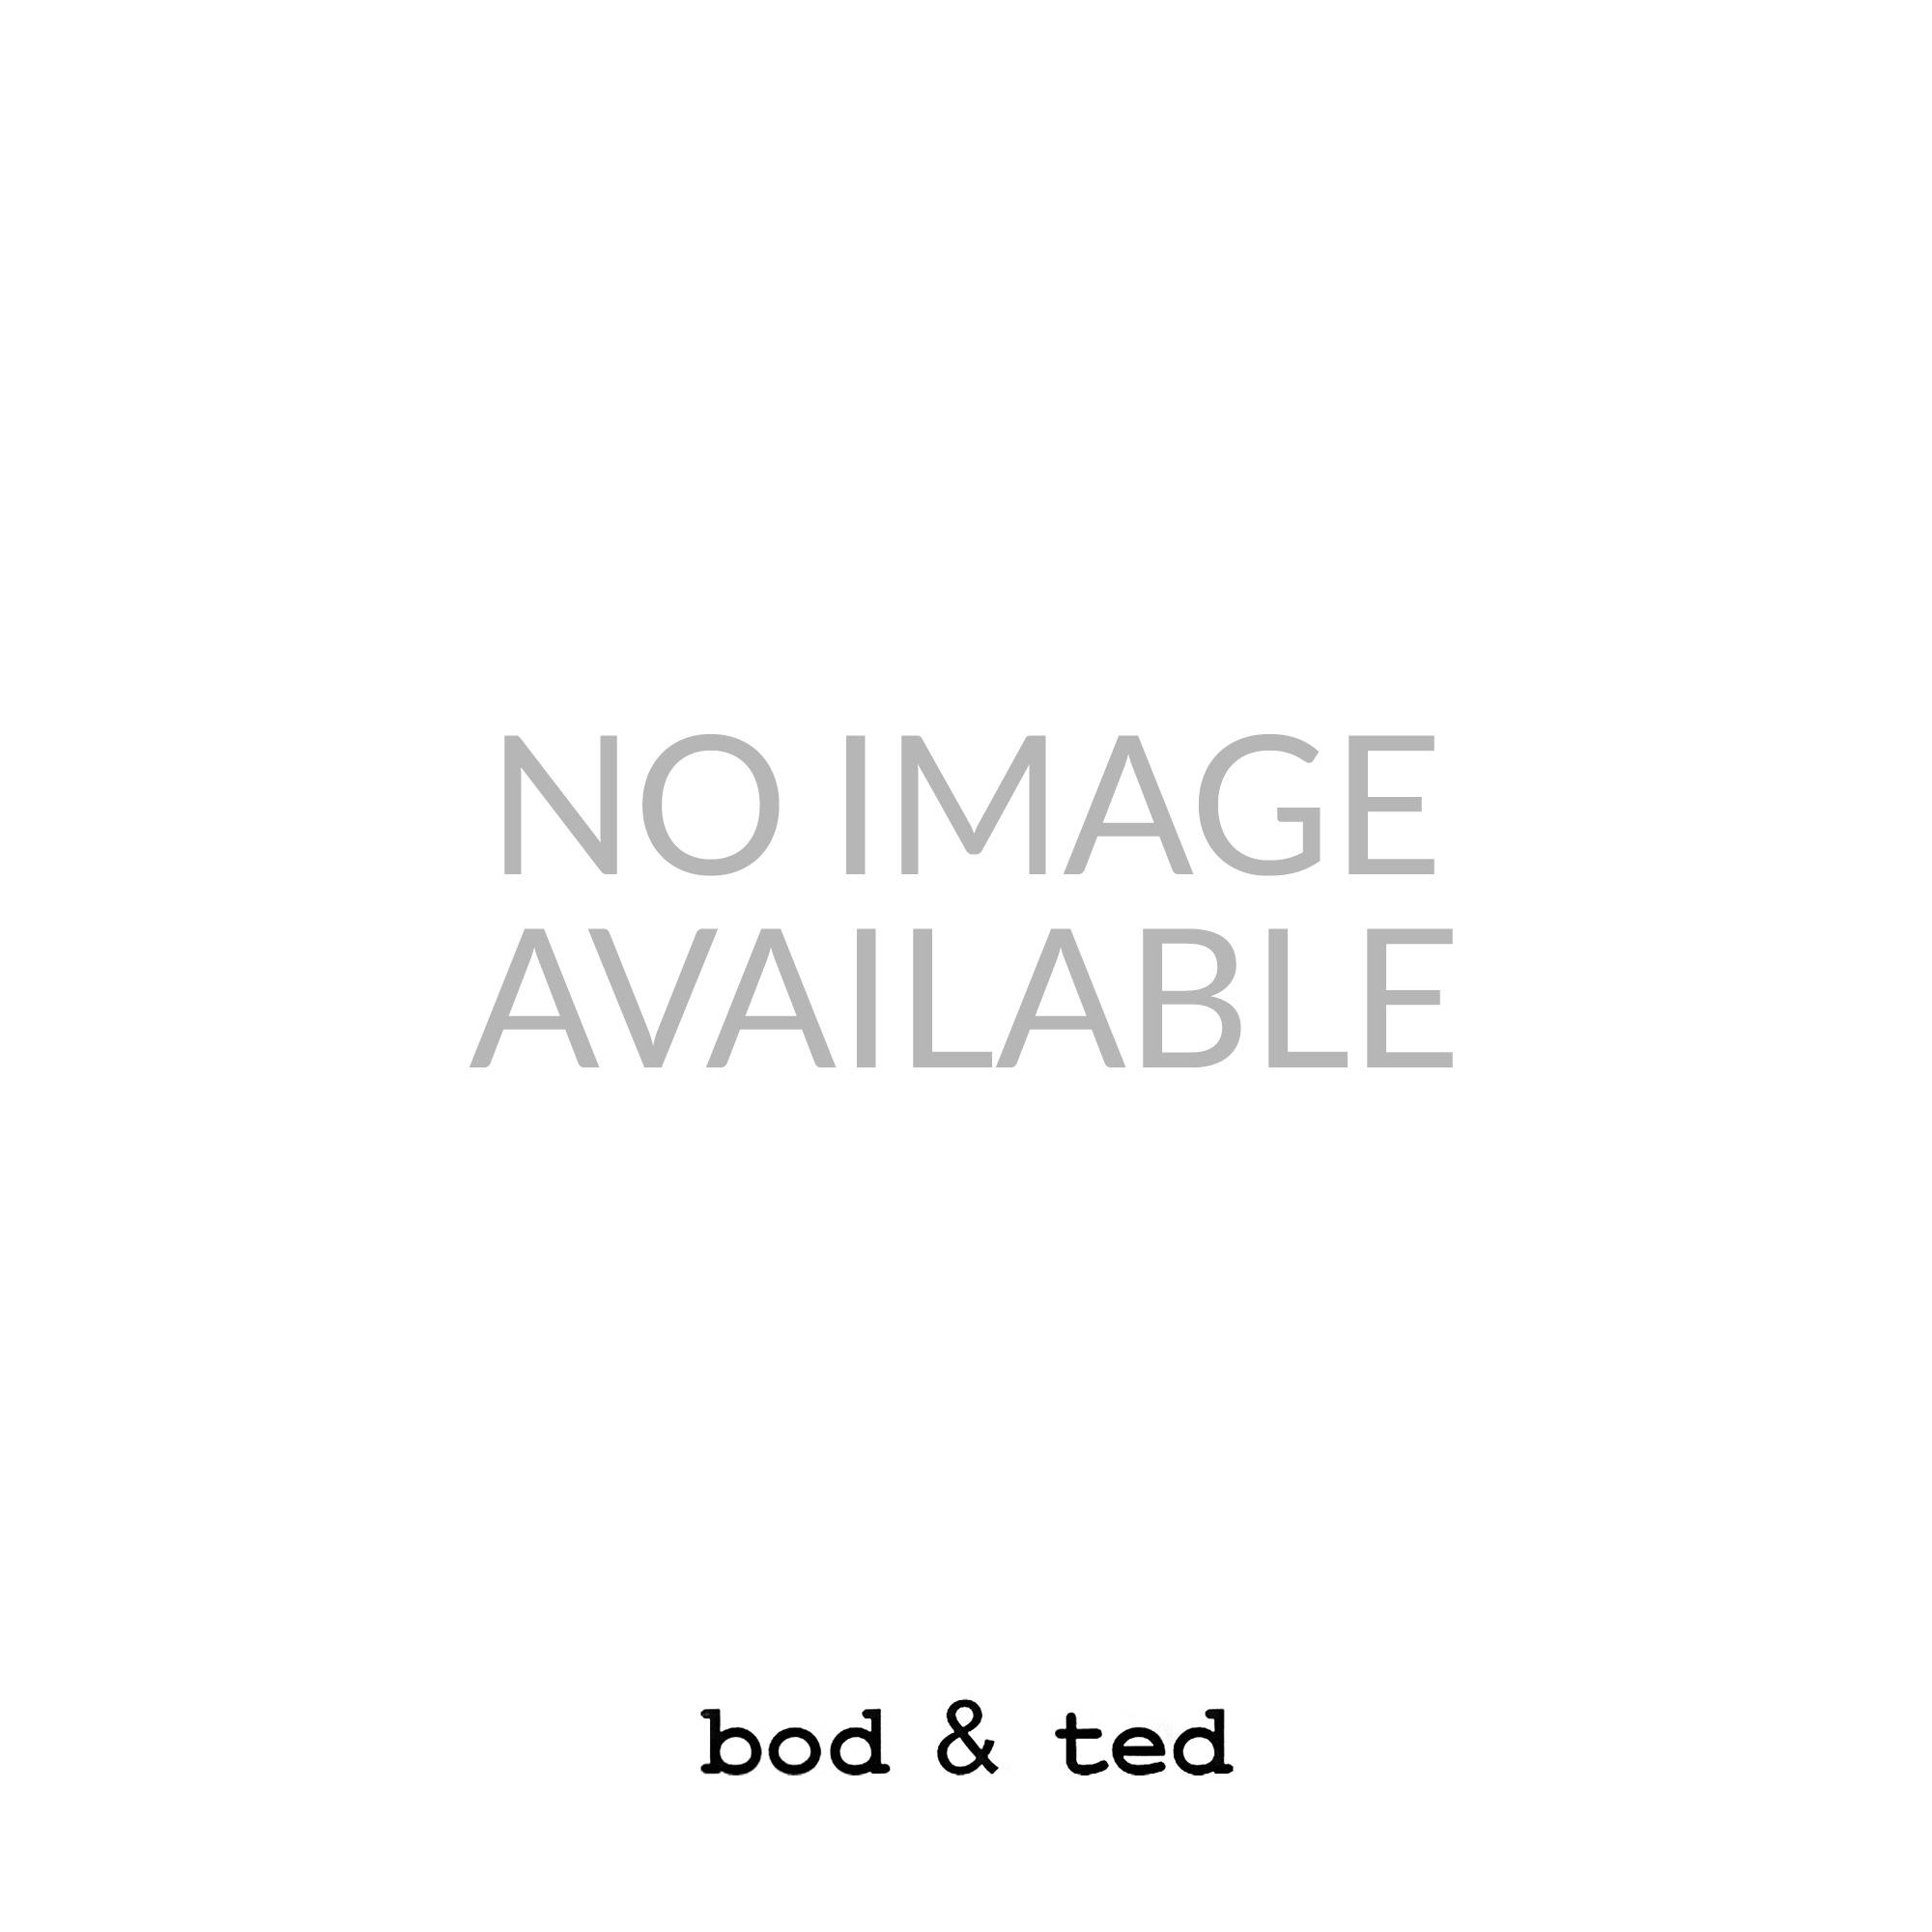 Clothing Labiche Maui T Shirt In Maison Khaki Bod From Fantastic nw8kXPO0